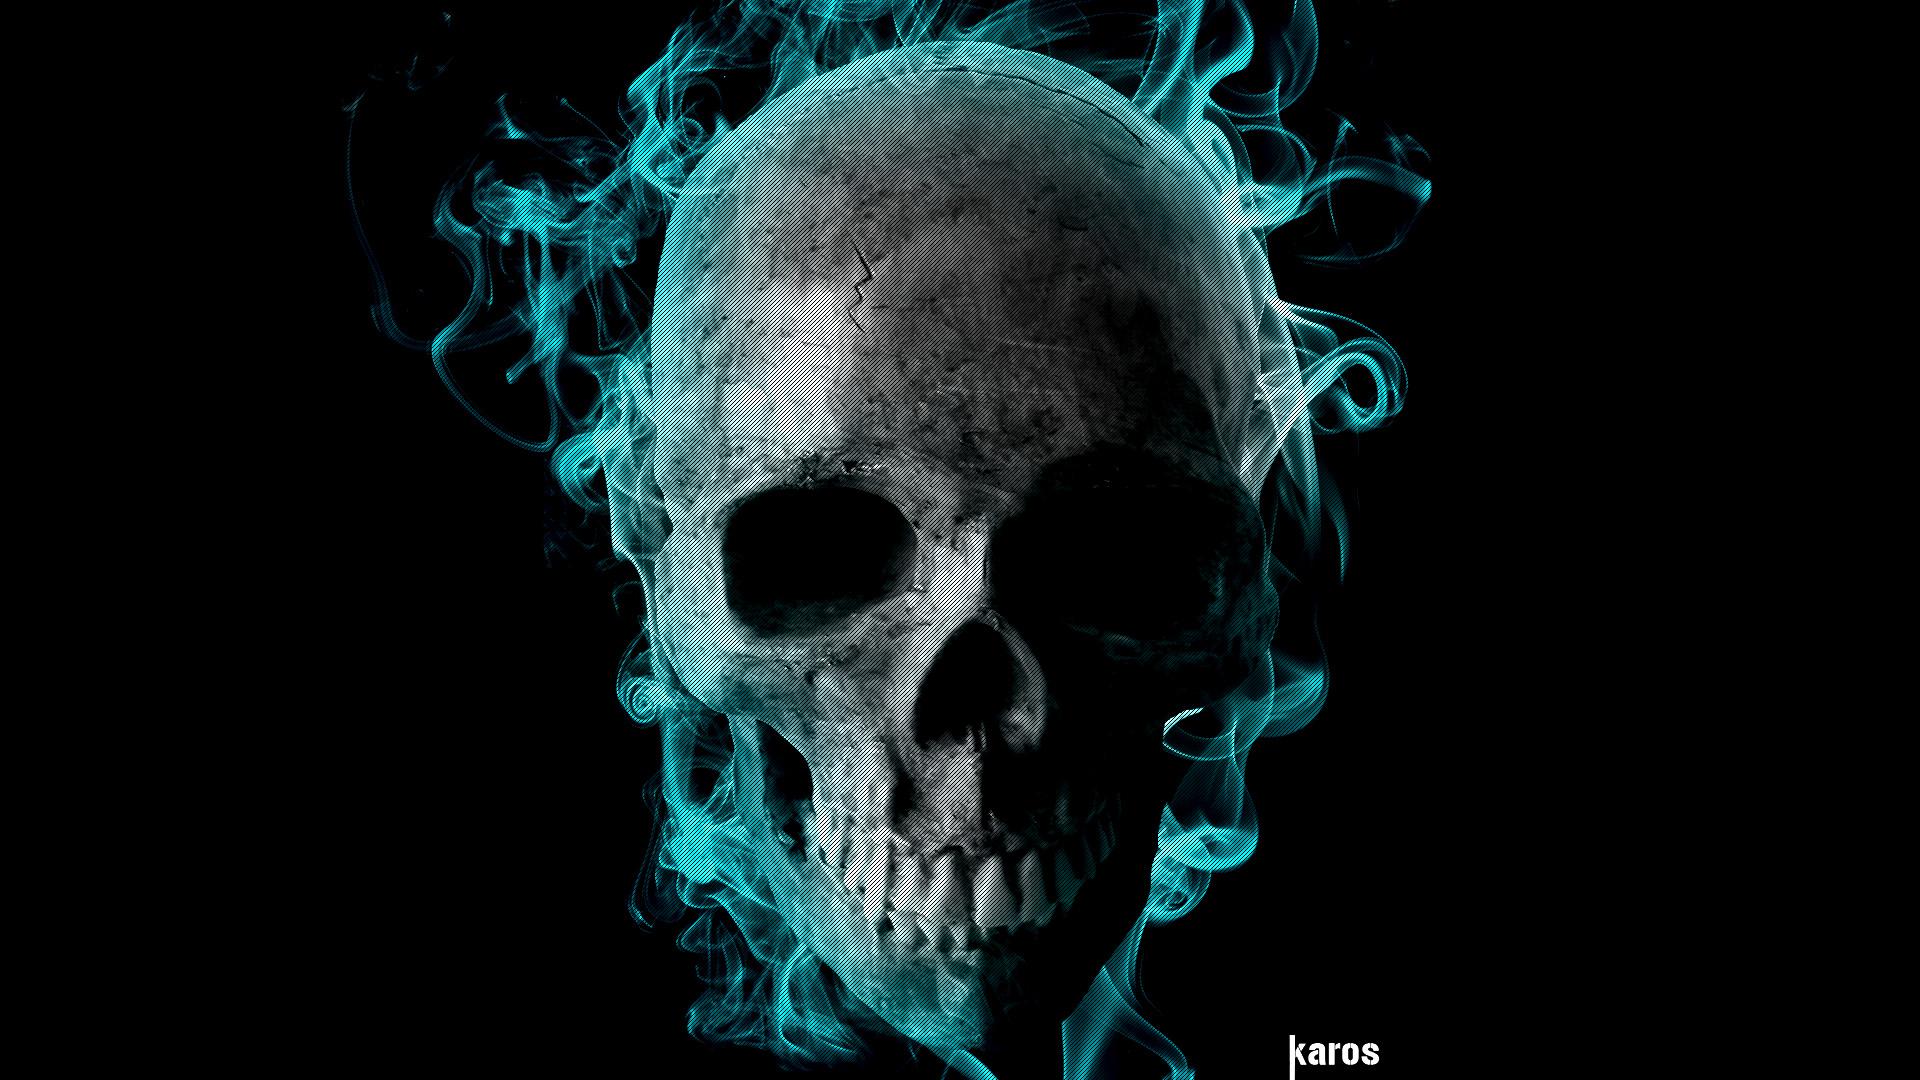 Flaming Skull by romulocarrijo 1920x1080